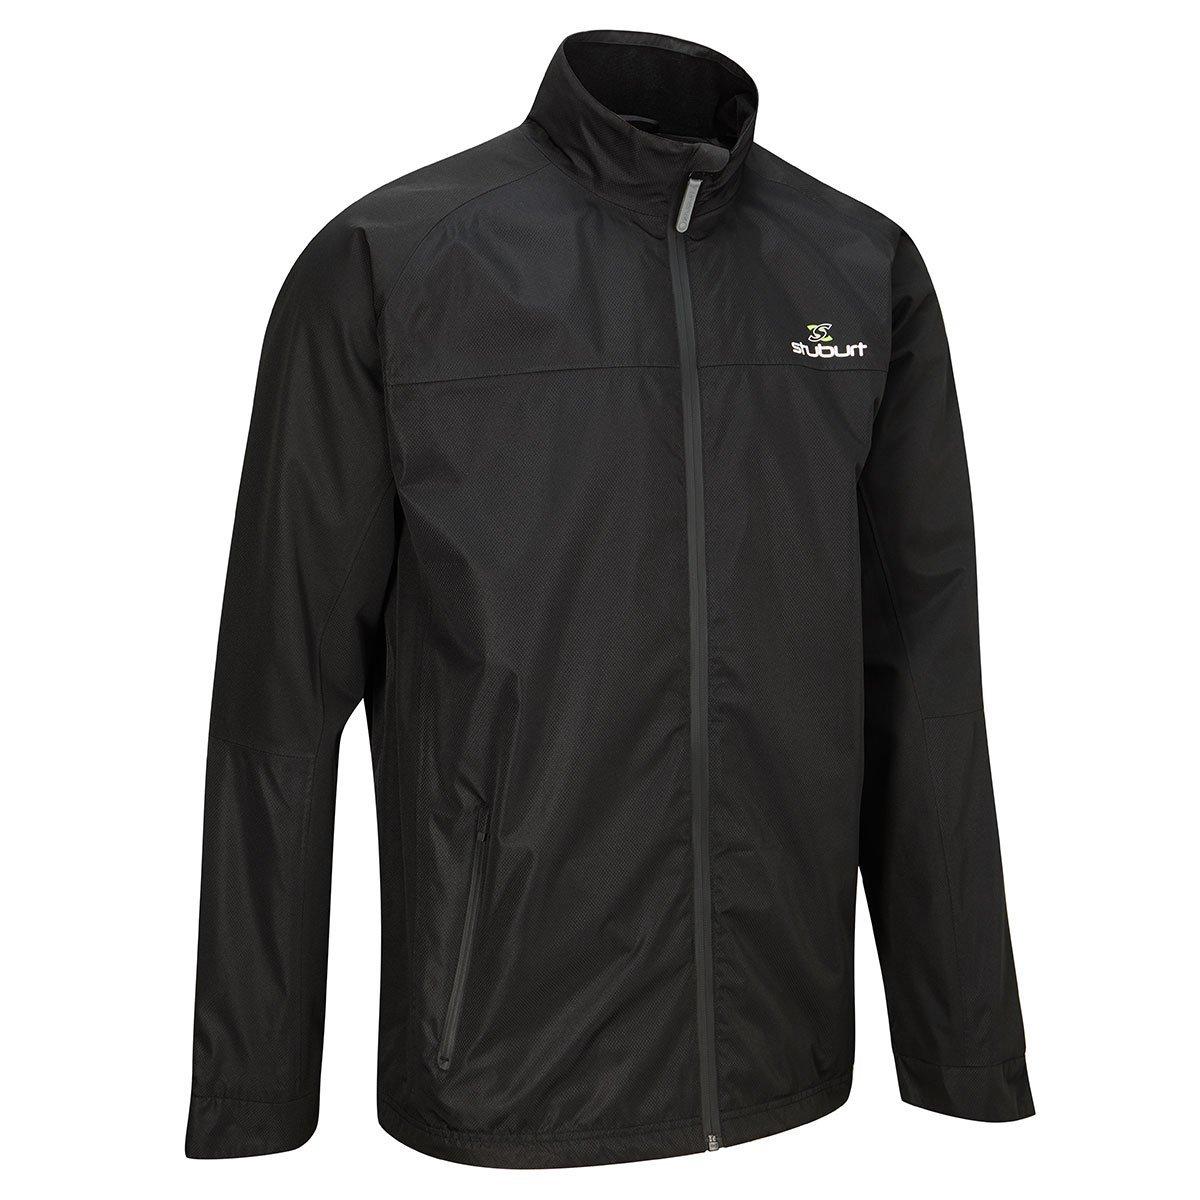 Stuburt Stuburt Stuburt Hydro Sport Herren Anzug, wasserdicht B07G37TVYT Bekleidung Qualitätsprodukte b13bc8